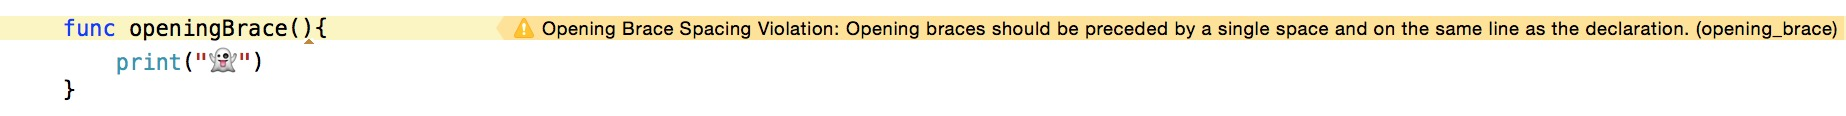 opening_brace